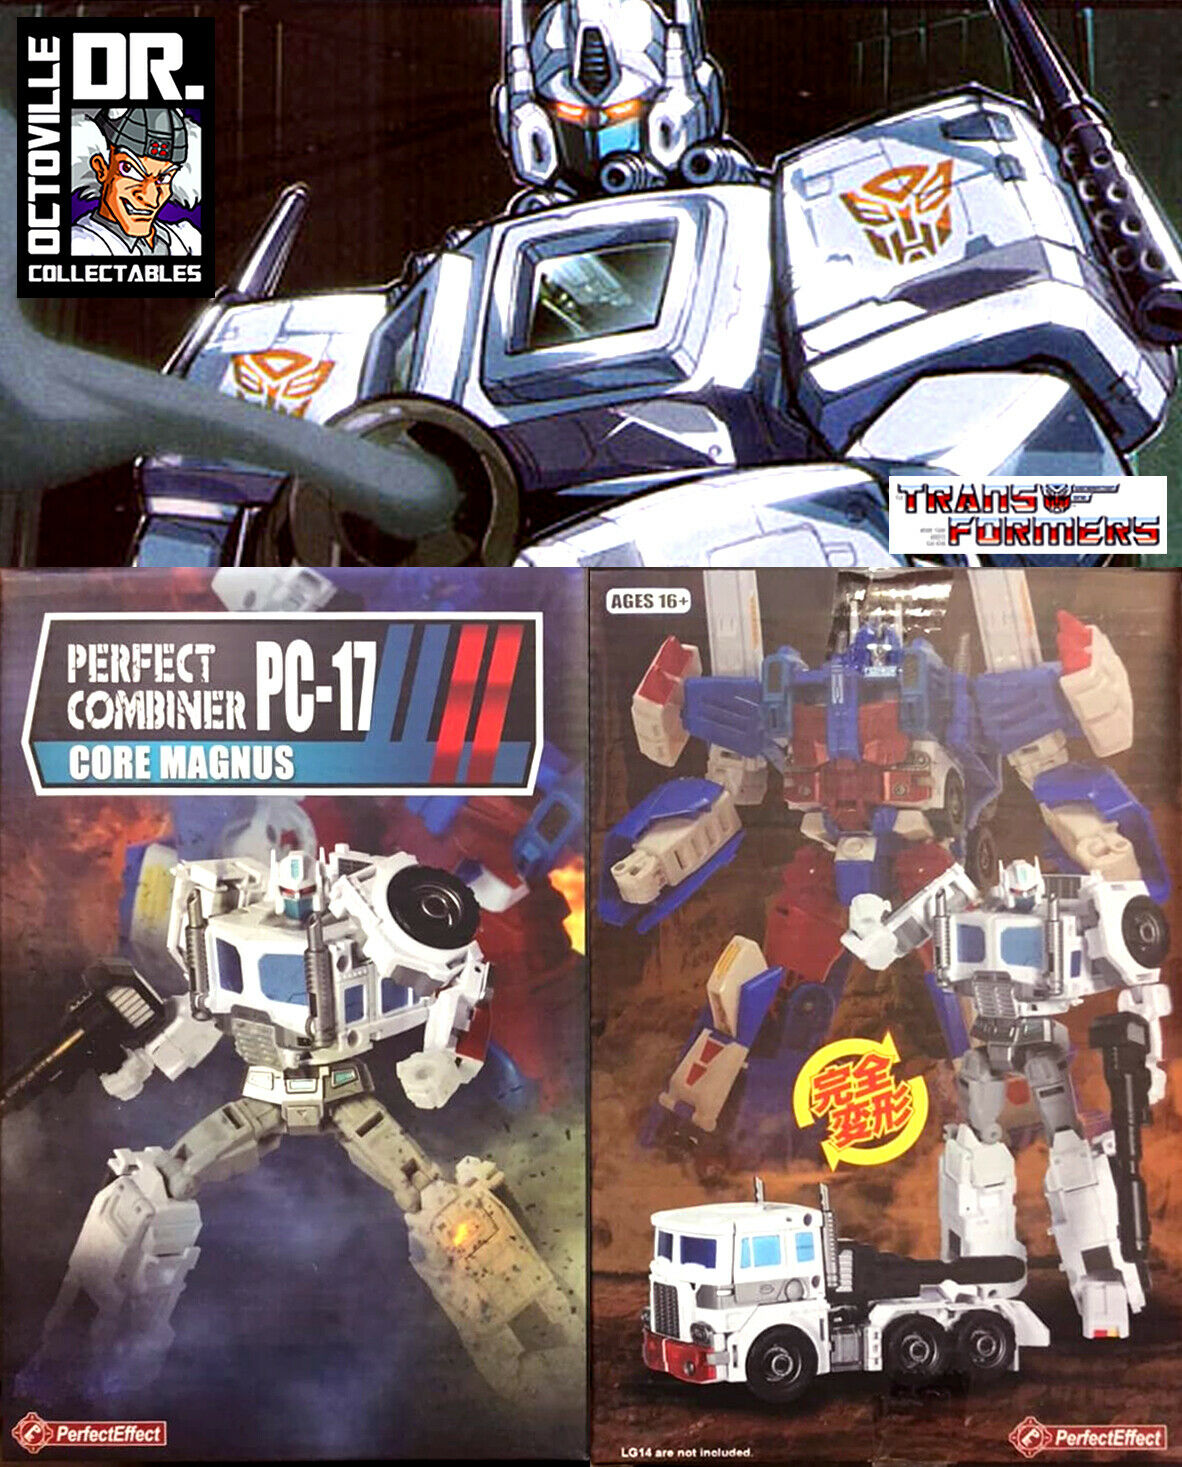 Transformers Transformers Transformers PC-17 Perfect Effect Core Magnus Upgrade Kit for Ultra Magnus MISB 733056